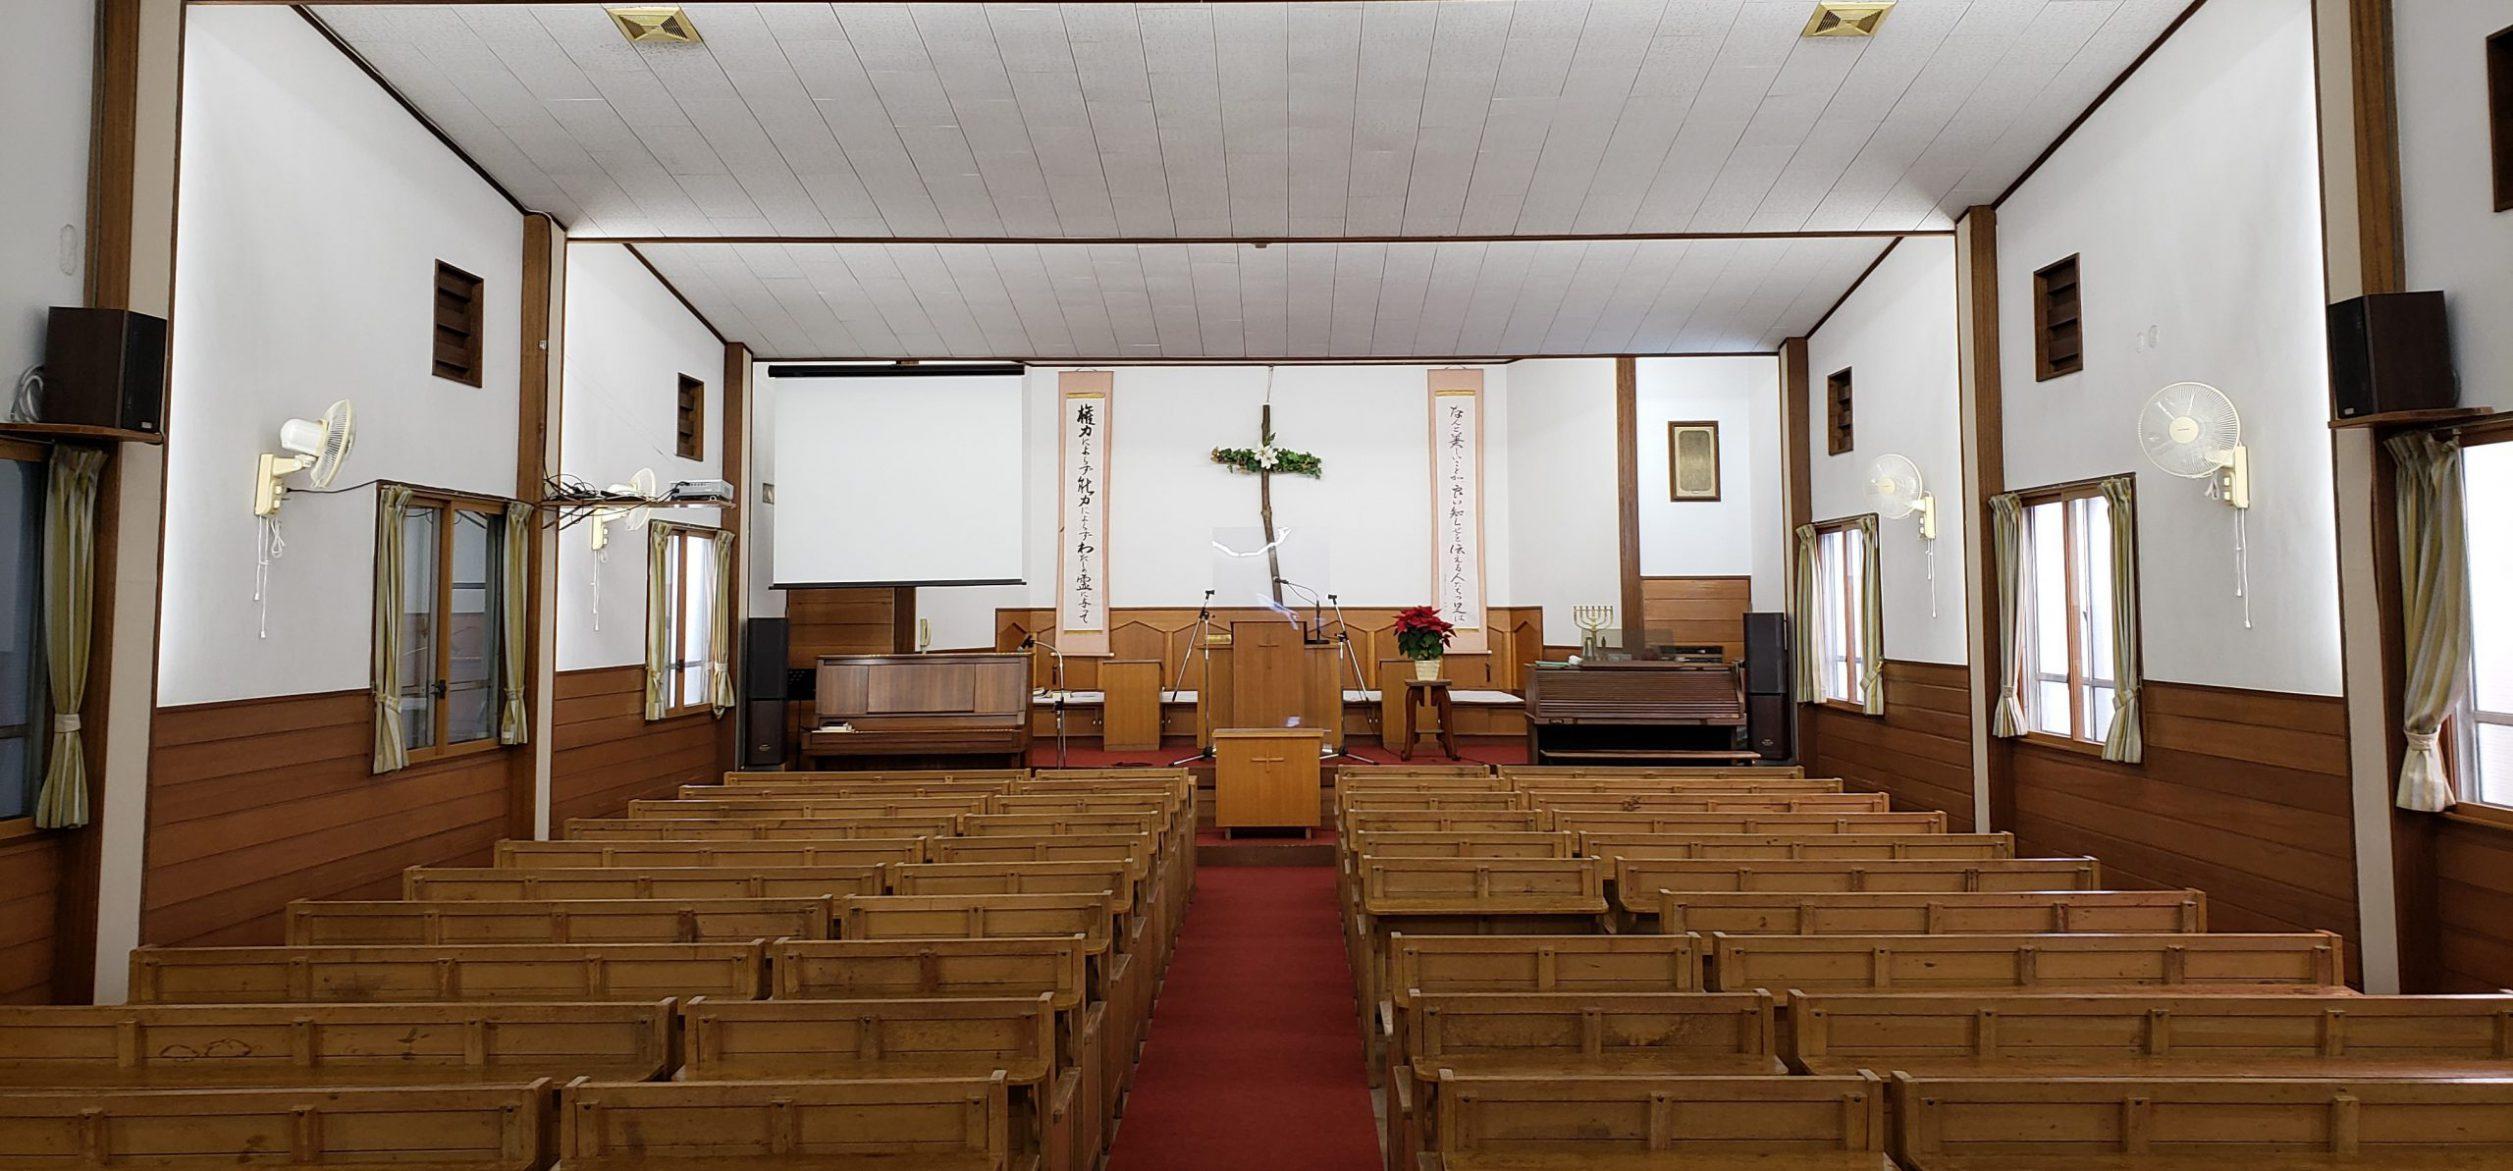 God is Love-日曜日には教会へ